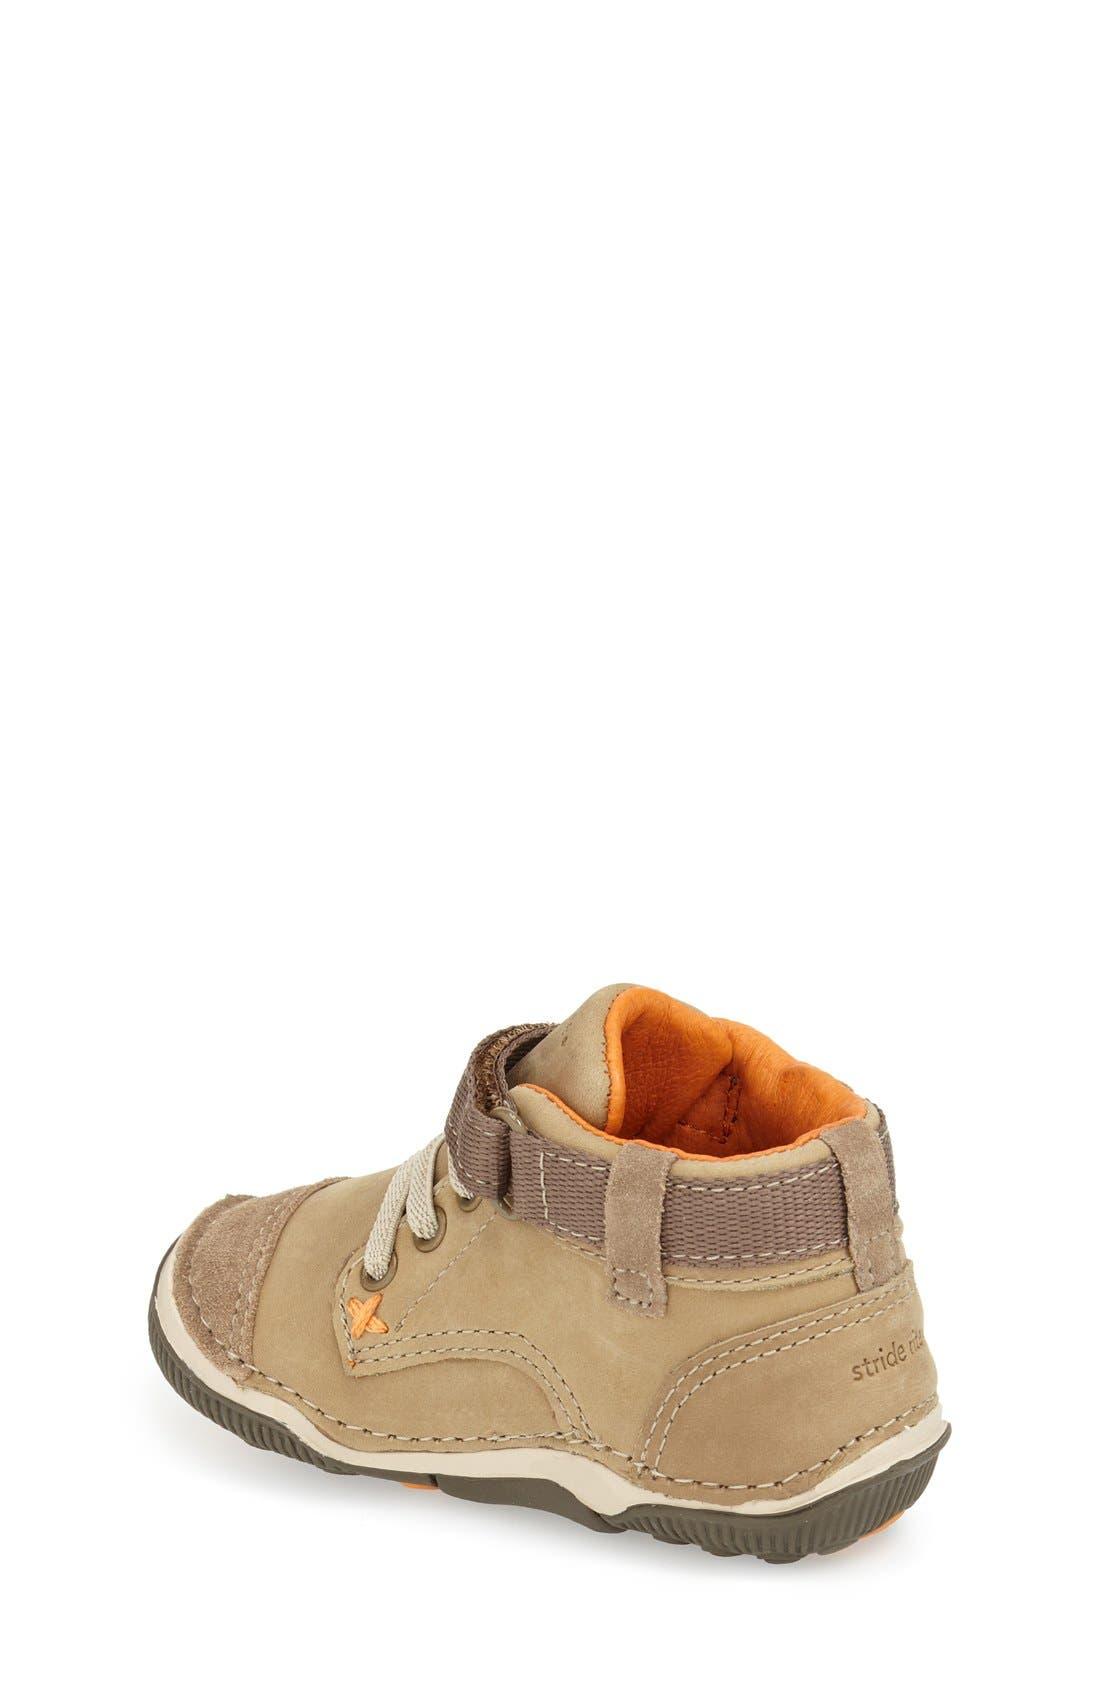 'Garrett' High Top Bootie Sneaker,                             Alternate thumbnail 2, color,                             BROWN